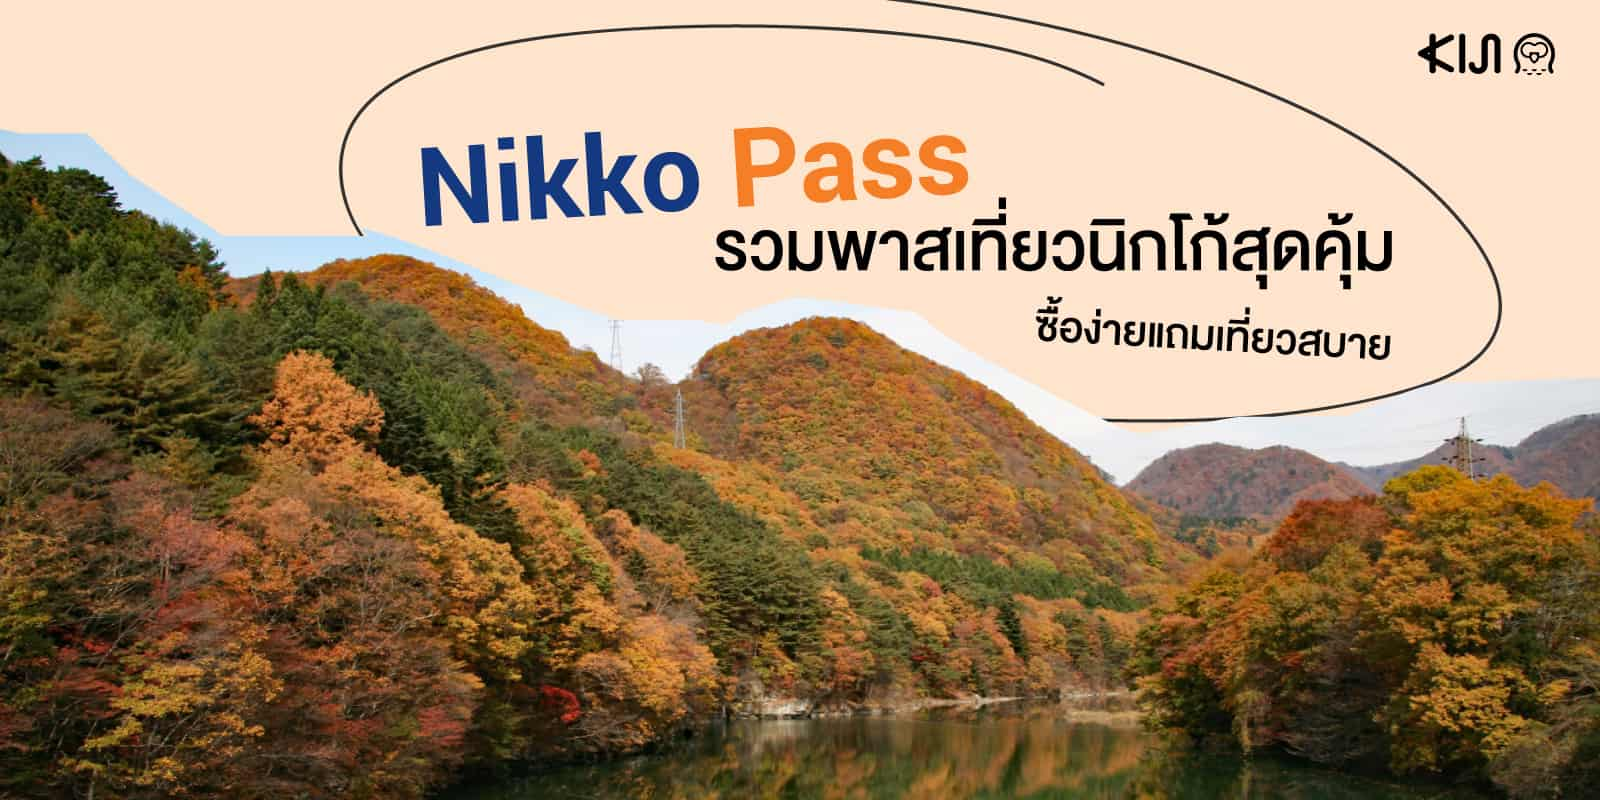 Nikko Pass พาสเที่ยวนิกโก้